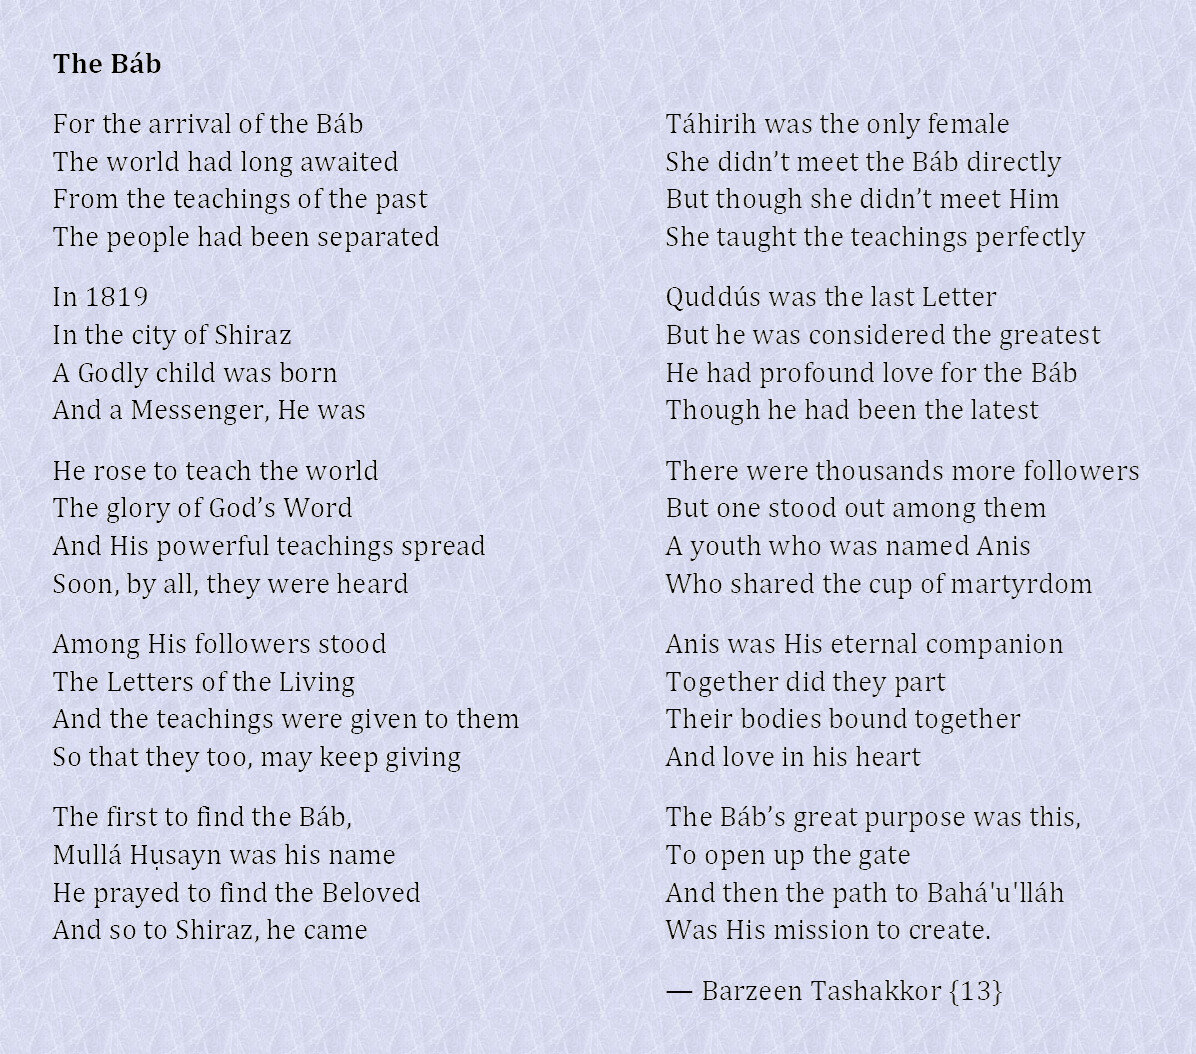 The Báb poem